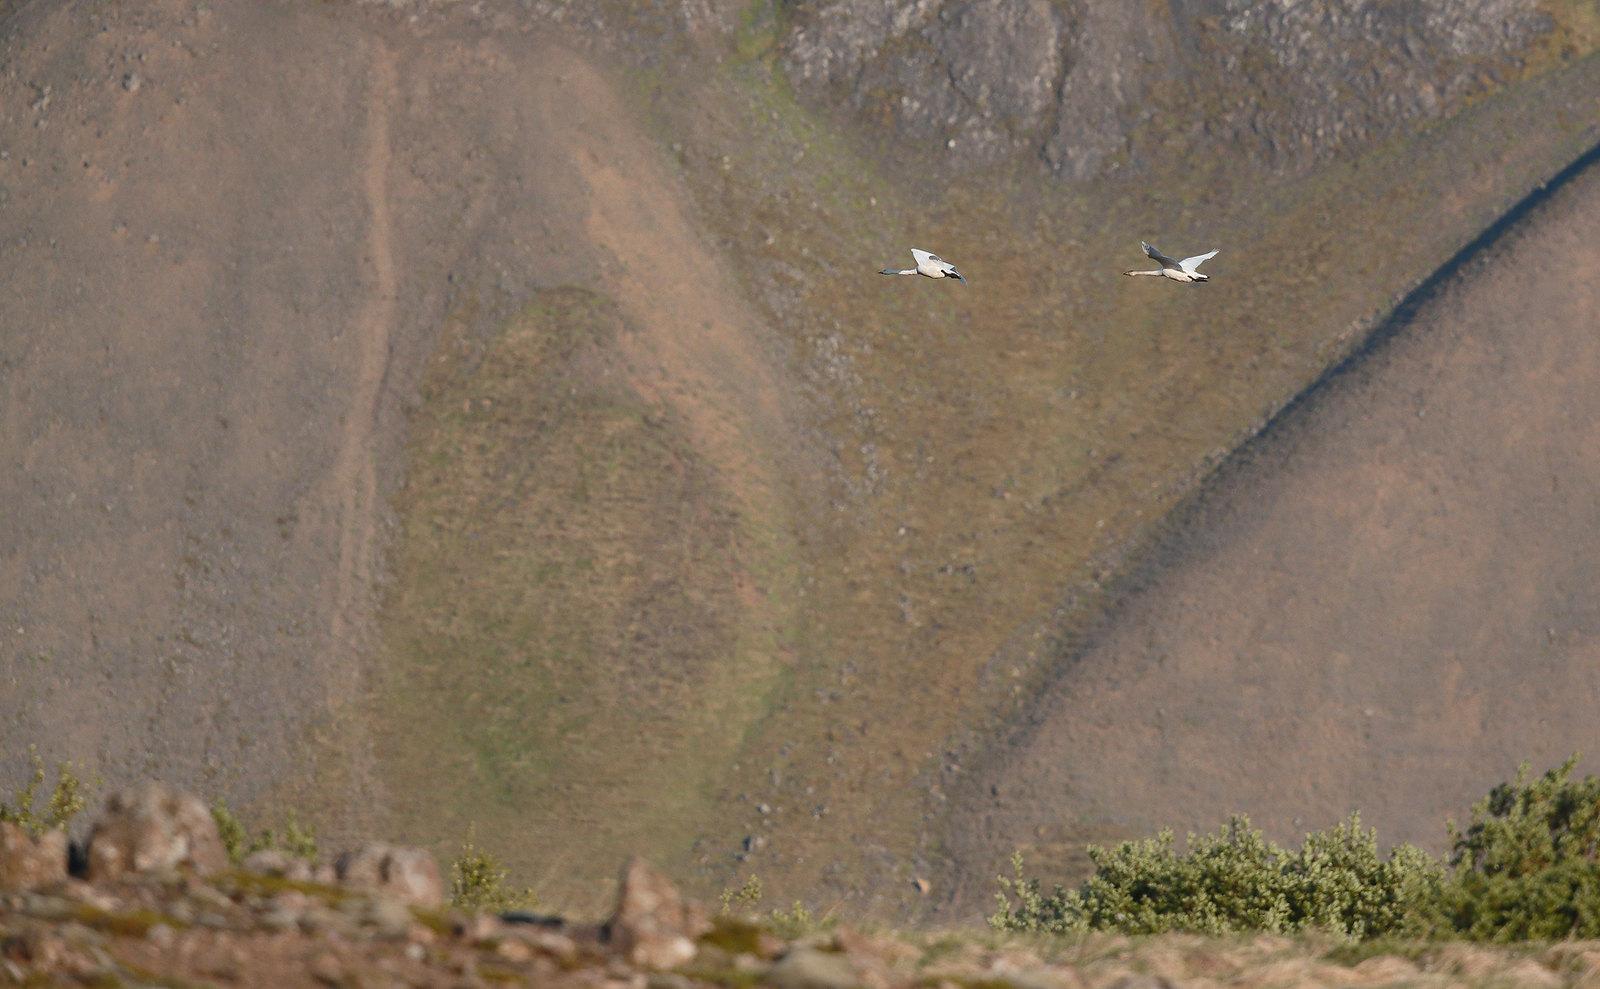 Whooper Swans in landscape